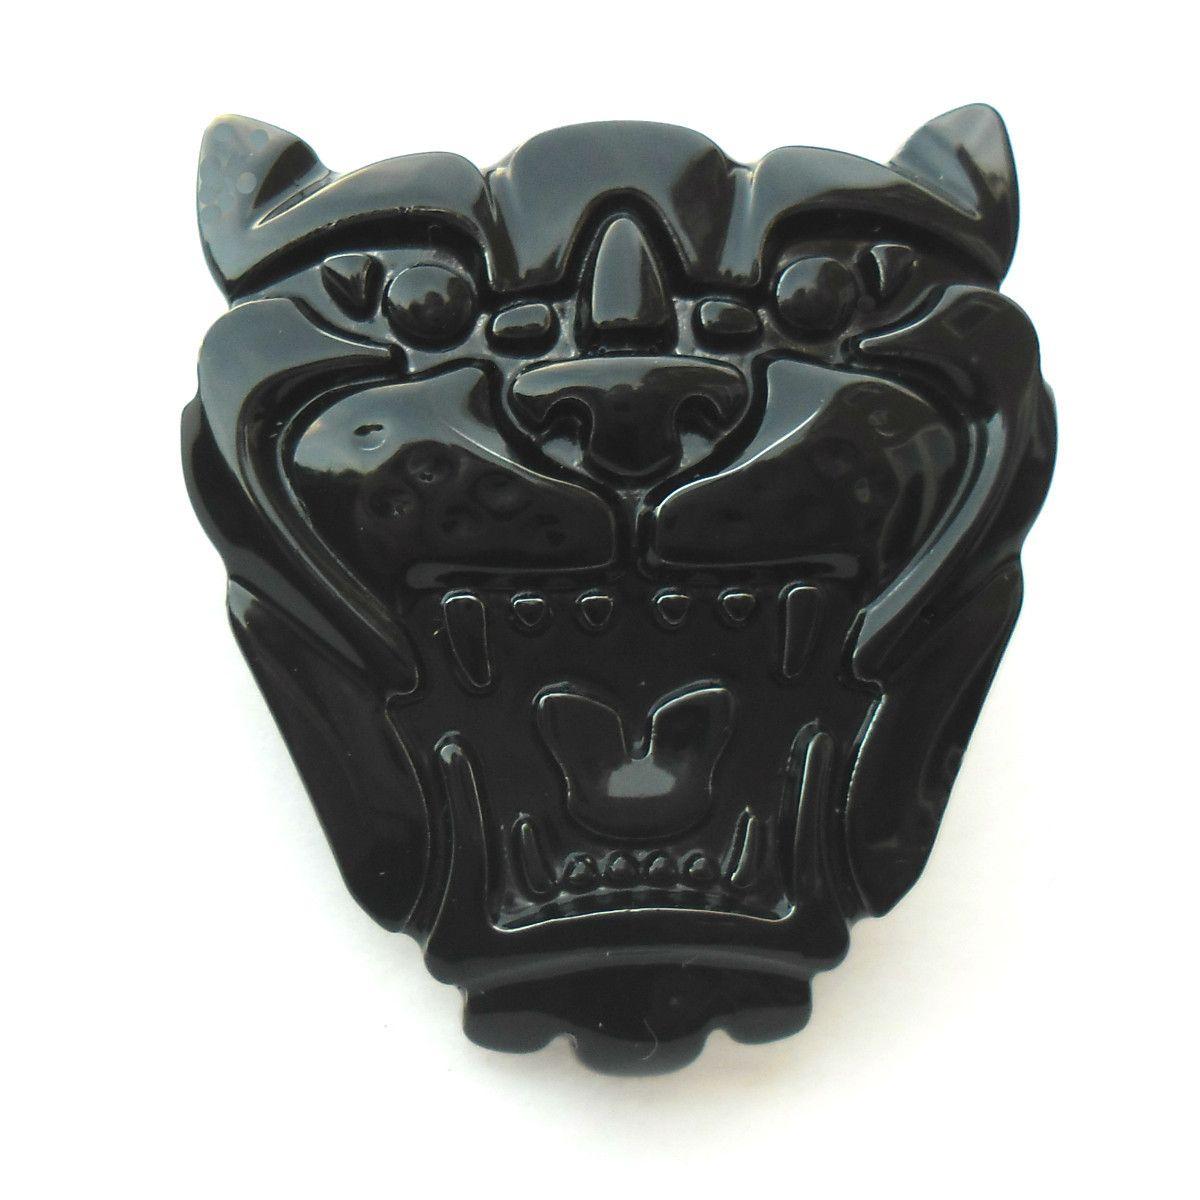 Jaguar Leaper  Jag Coventry Genuine Leather  Keyring  Beautiful Quality Item